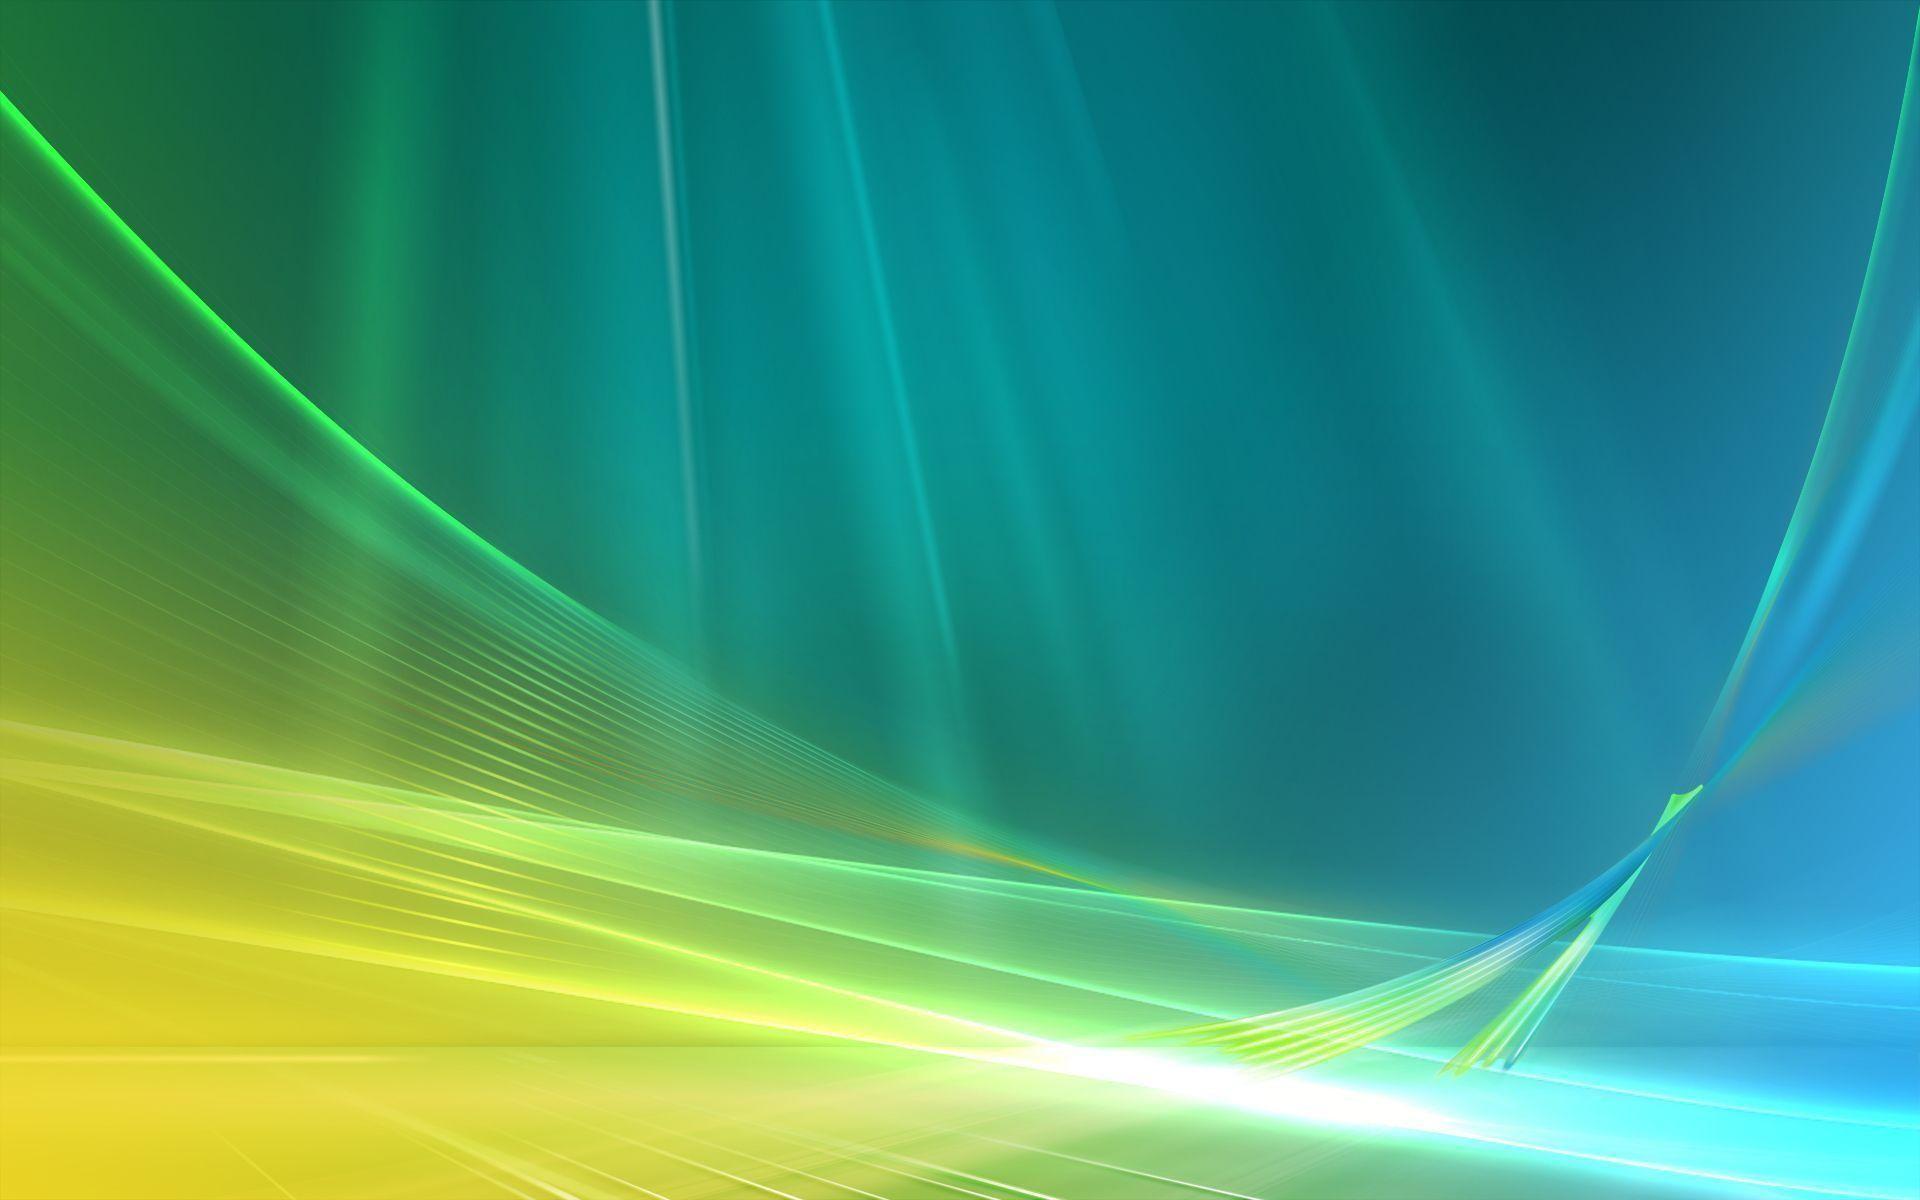 Windows Vista Wallpapers 1